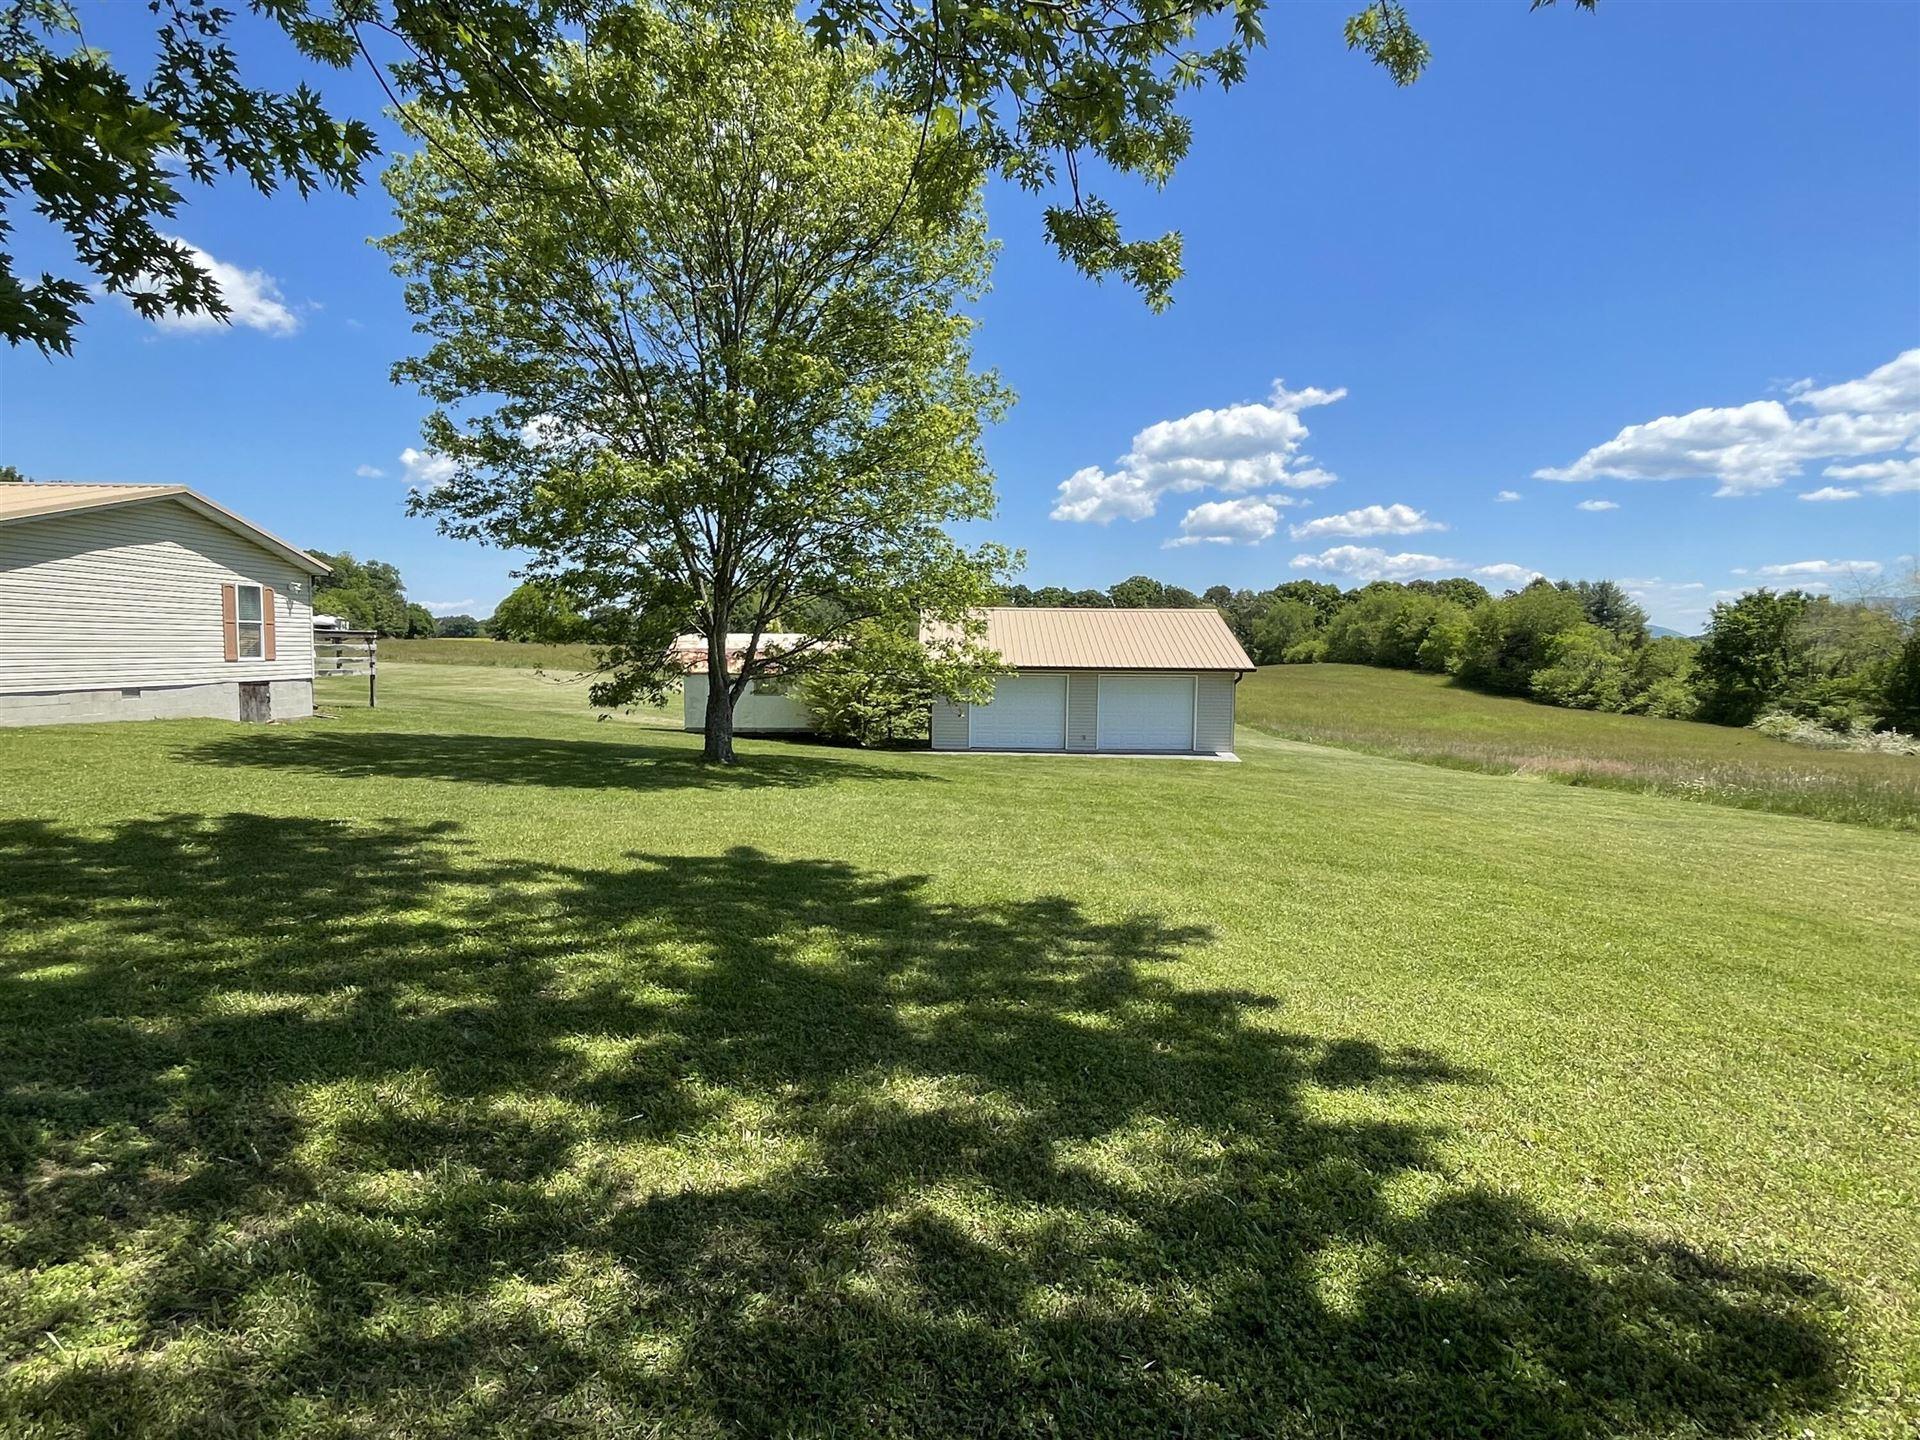 Photo of 142 Alfred Mccammon Rd, Maryville, TN 37804 (MLS # 1153368)